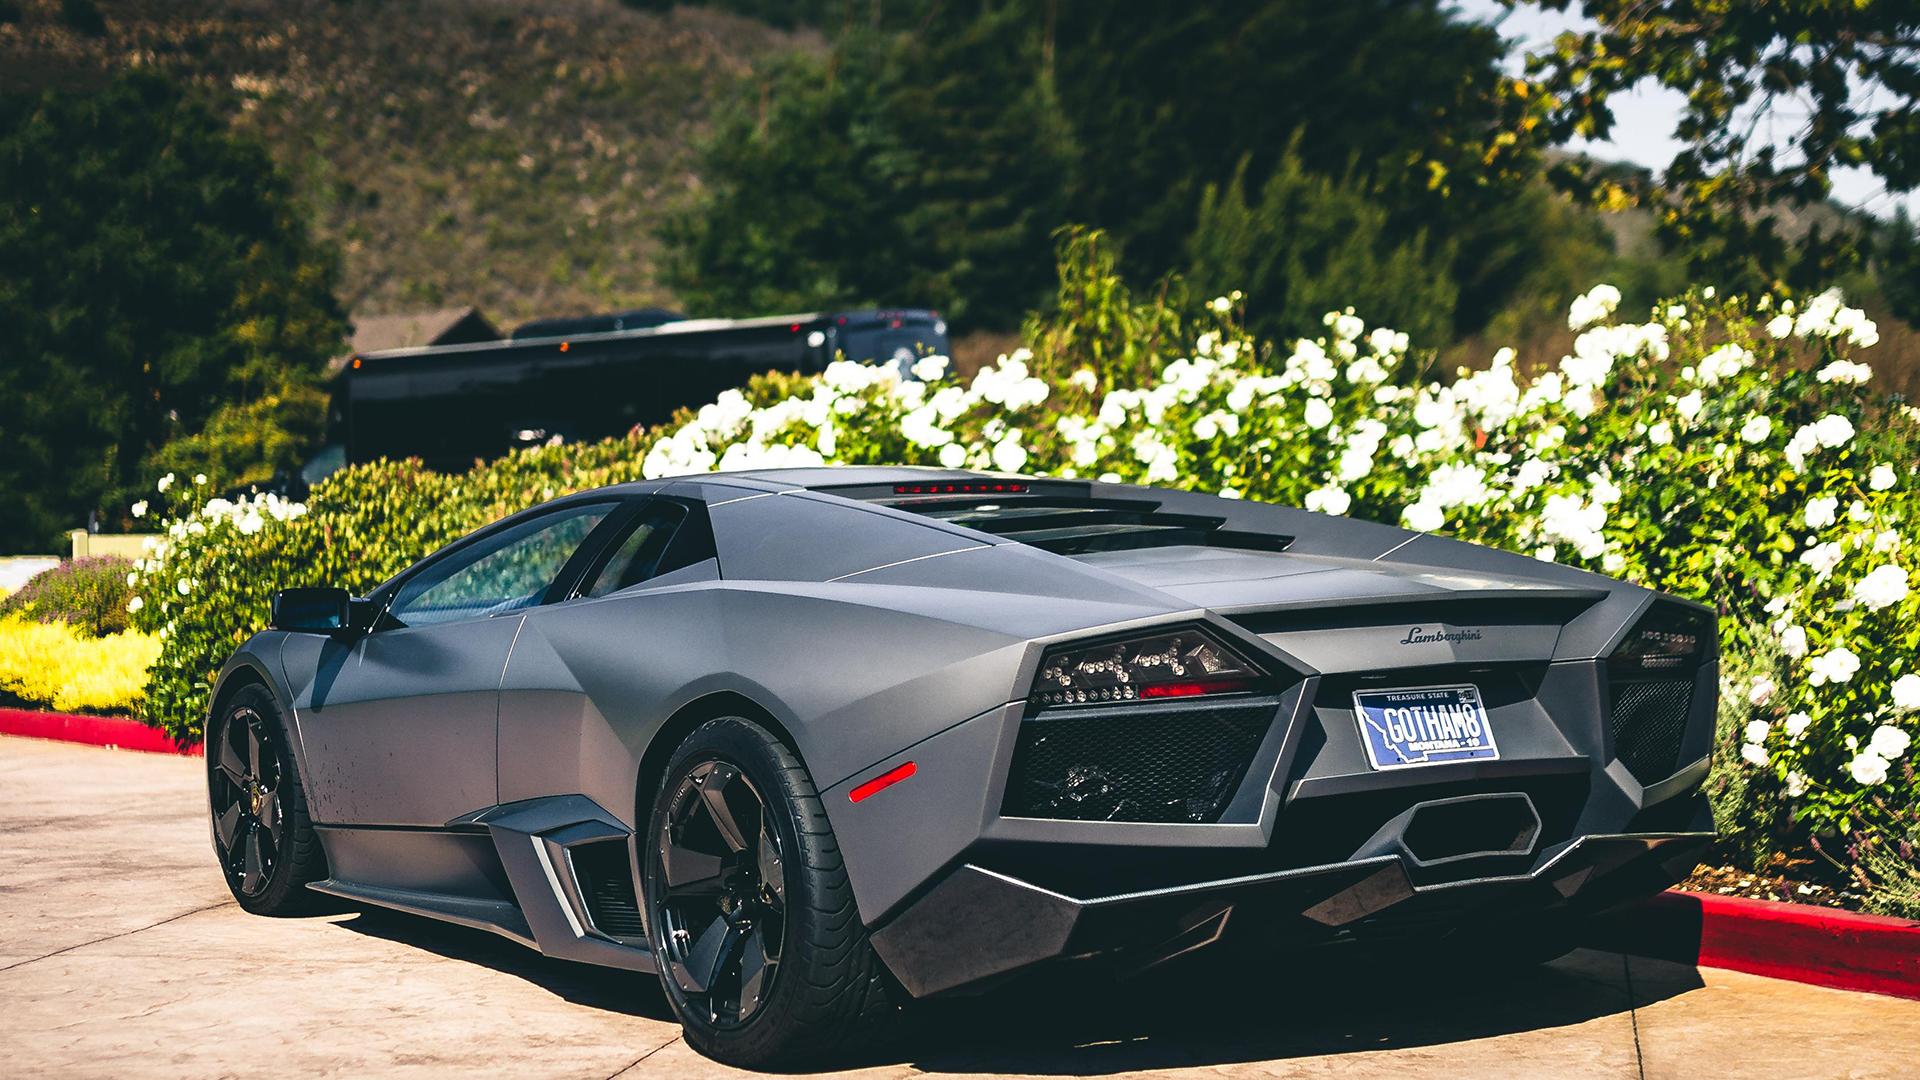 Lamborghini Reventon Hd Cars 4k Wallpapers Images Backgrounds